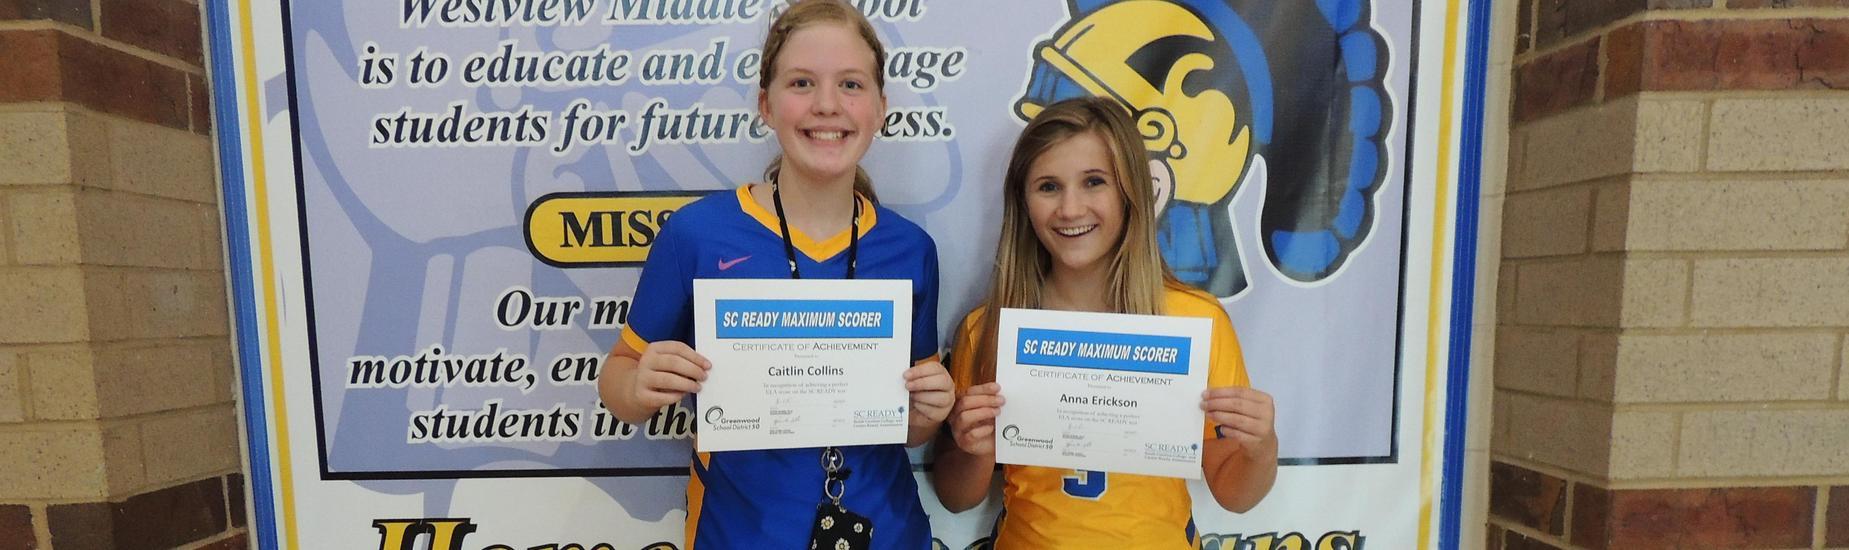 Caitlin Collins and Anna Erickson - SCReady Perfect Scorers in ELA